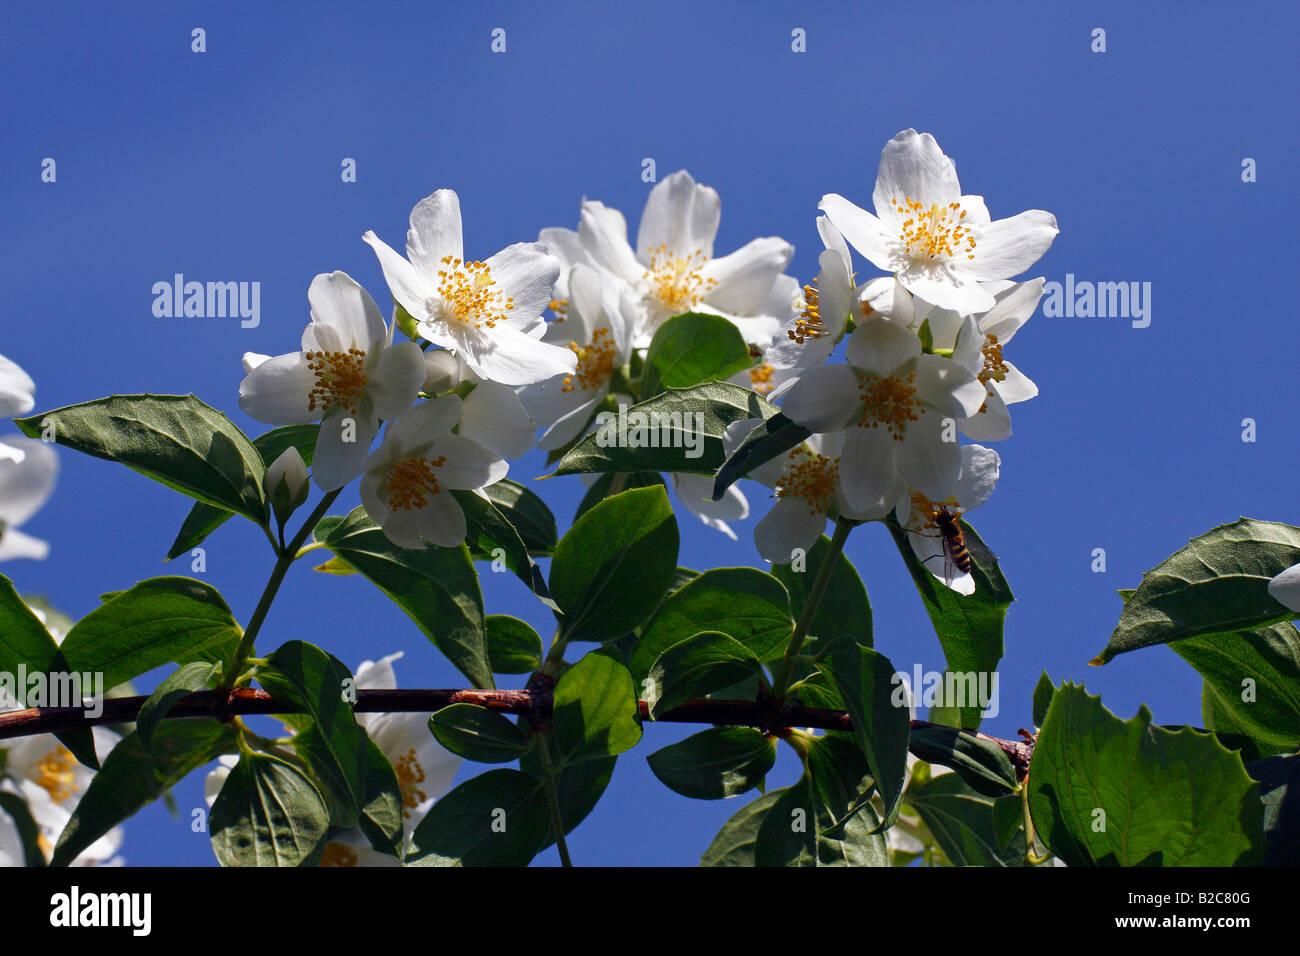 Flowering Sweet Mock Orange, Farmer Jasmine (Philadelphus coronarius) - Stock Image